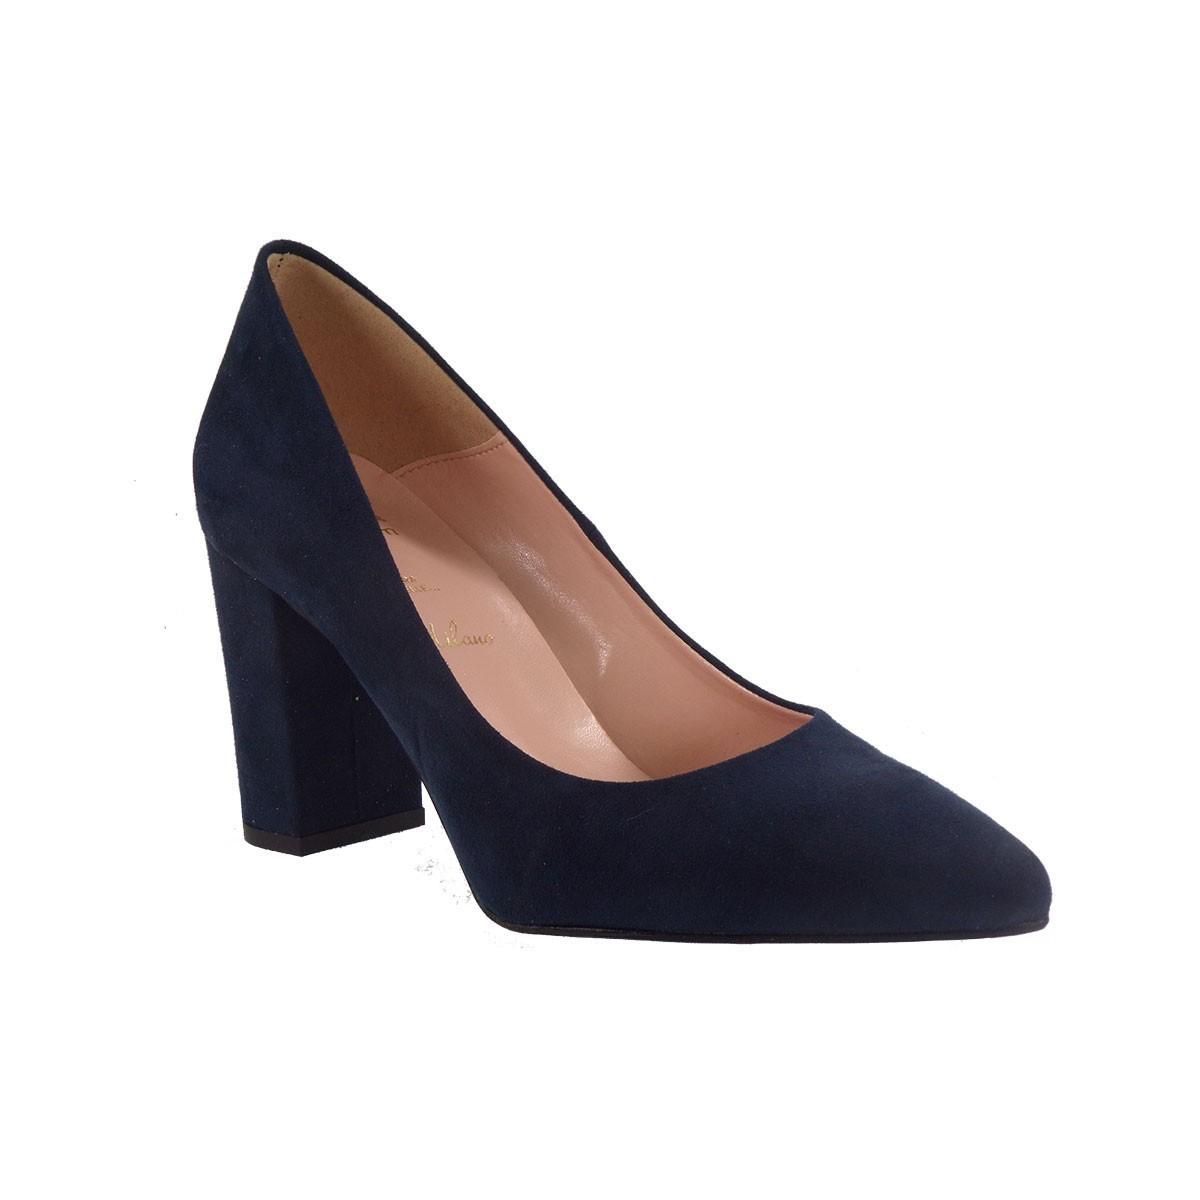 Alessandra Paggioti Γυναικεία Παπούτσια Γόβες 83002 Μπλέ Καστόρι